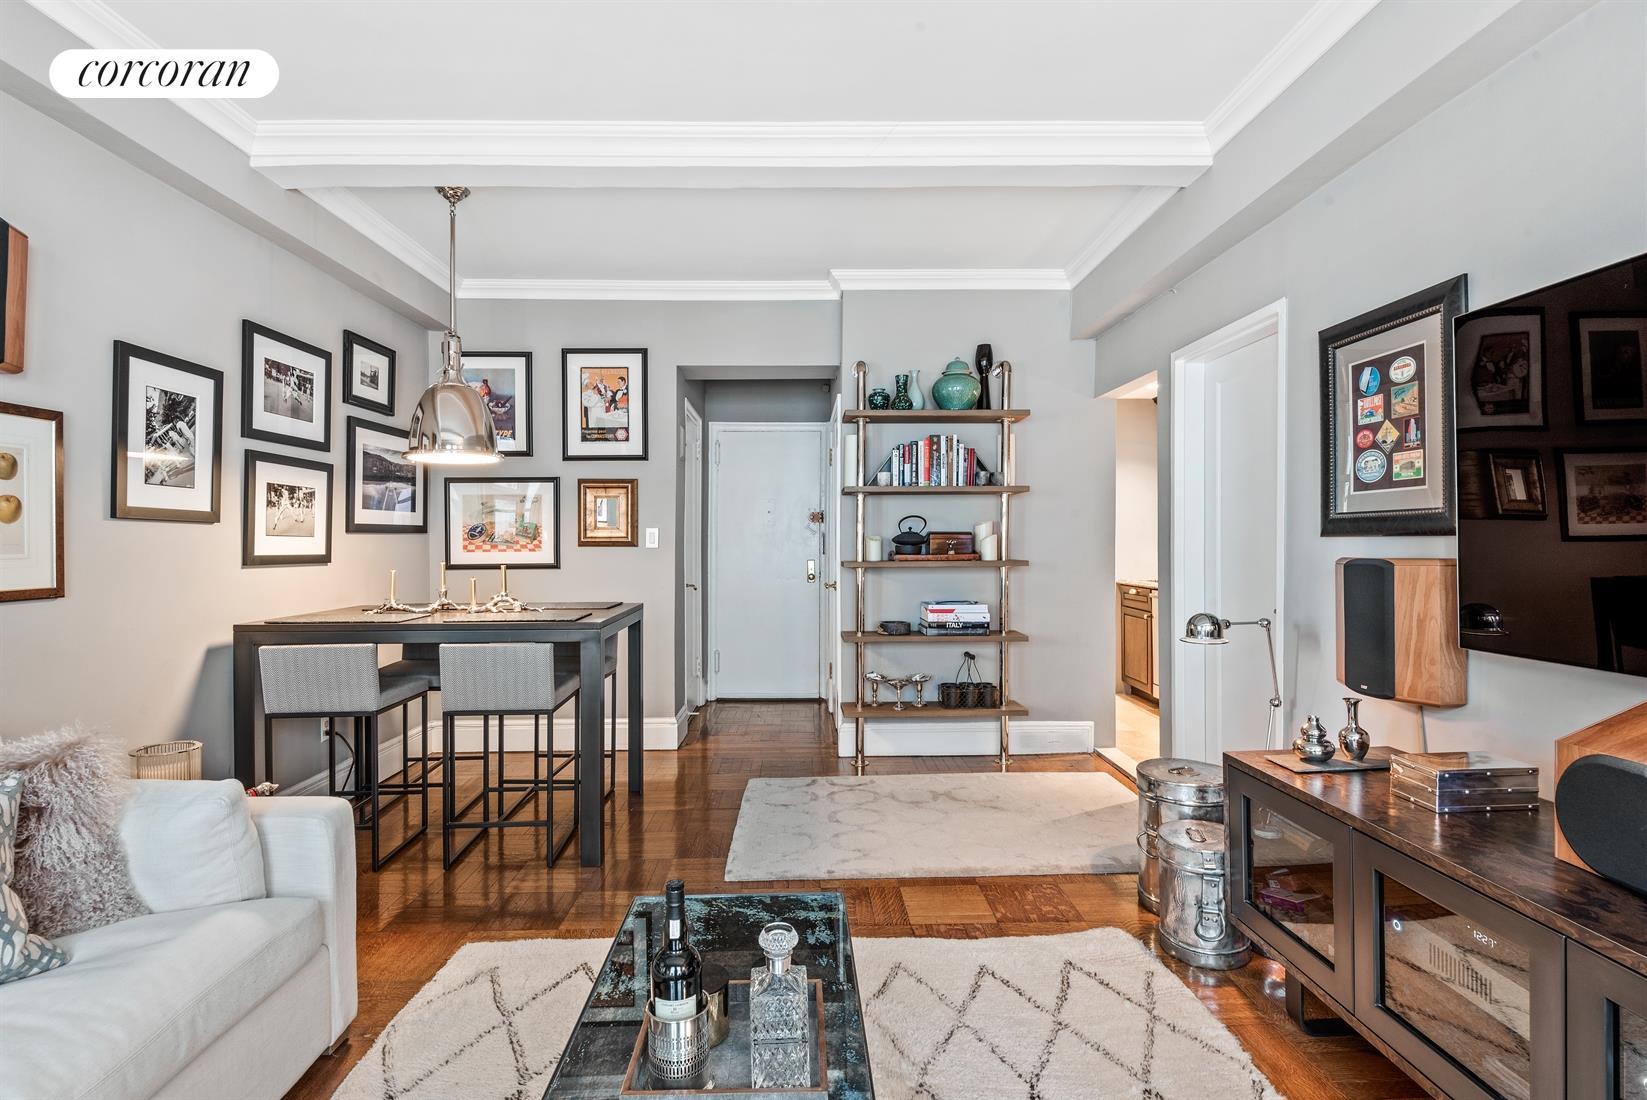 Apartment for sale at 225 Central Park West, Apt 1121